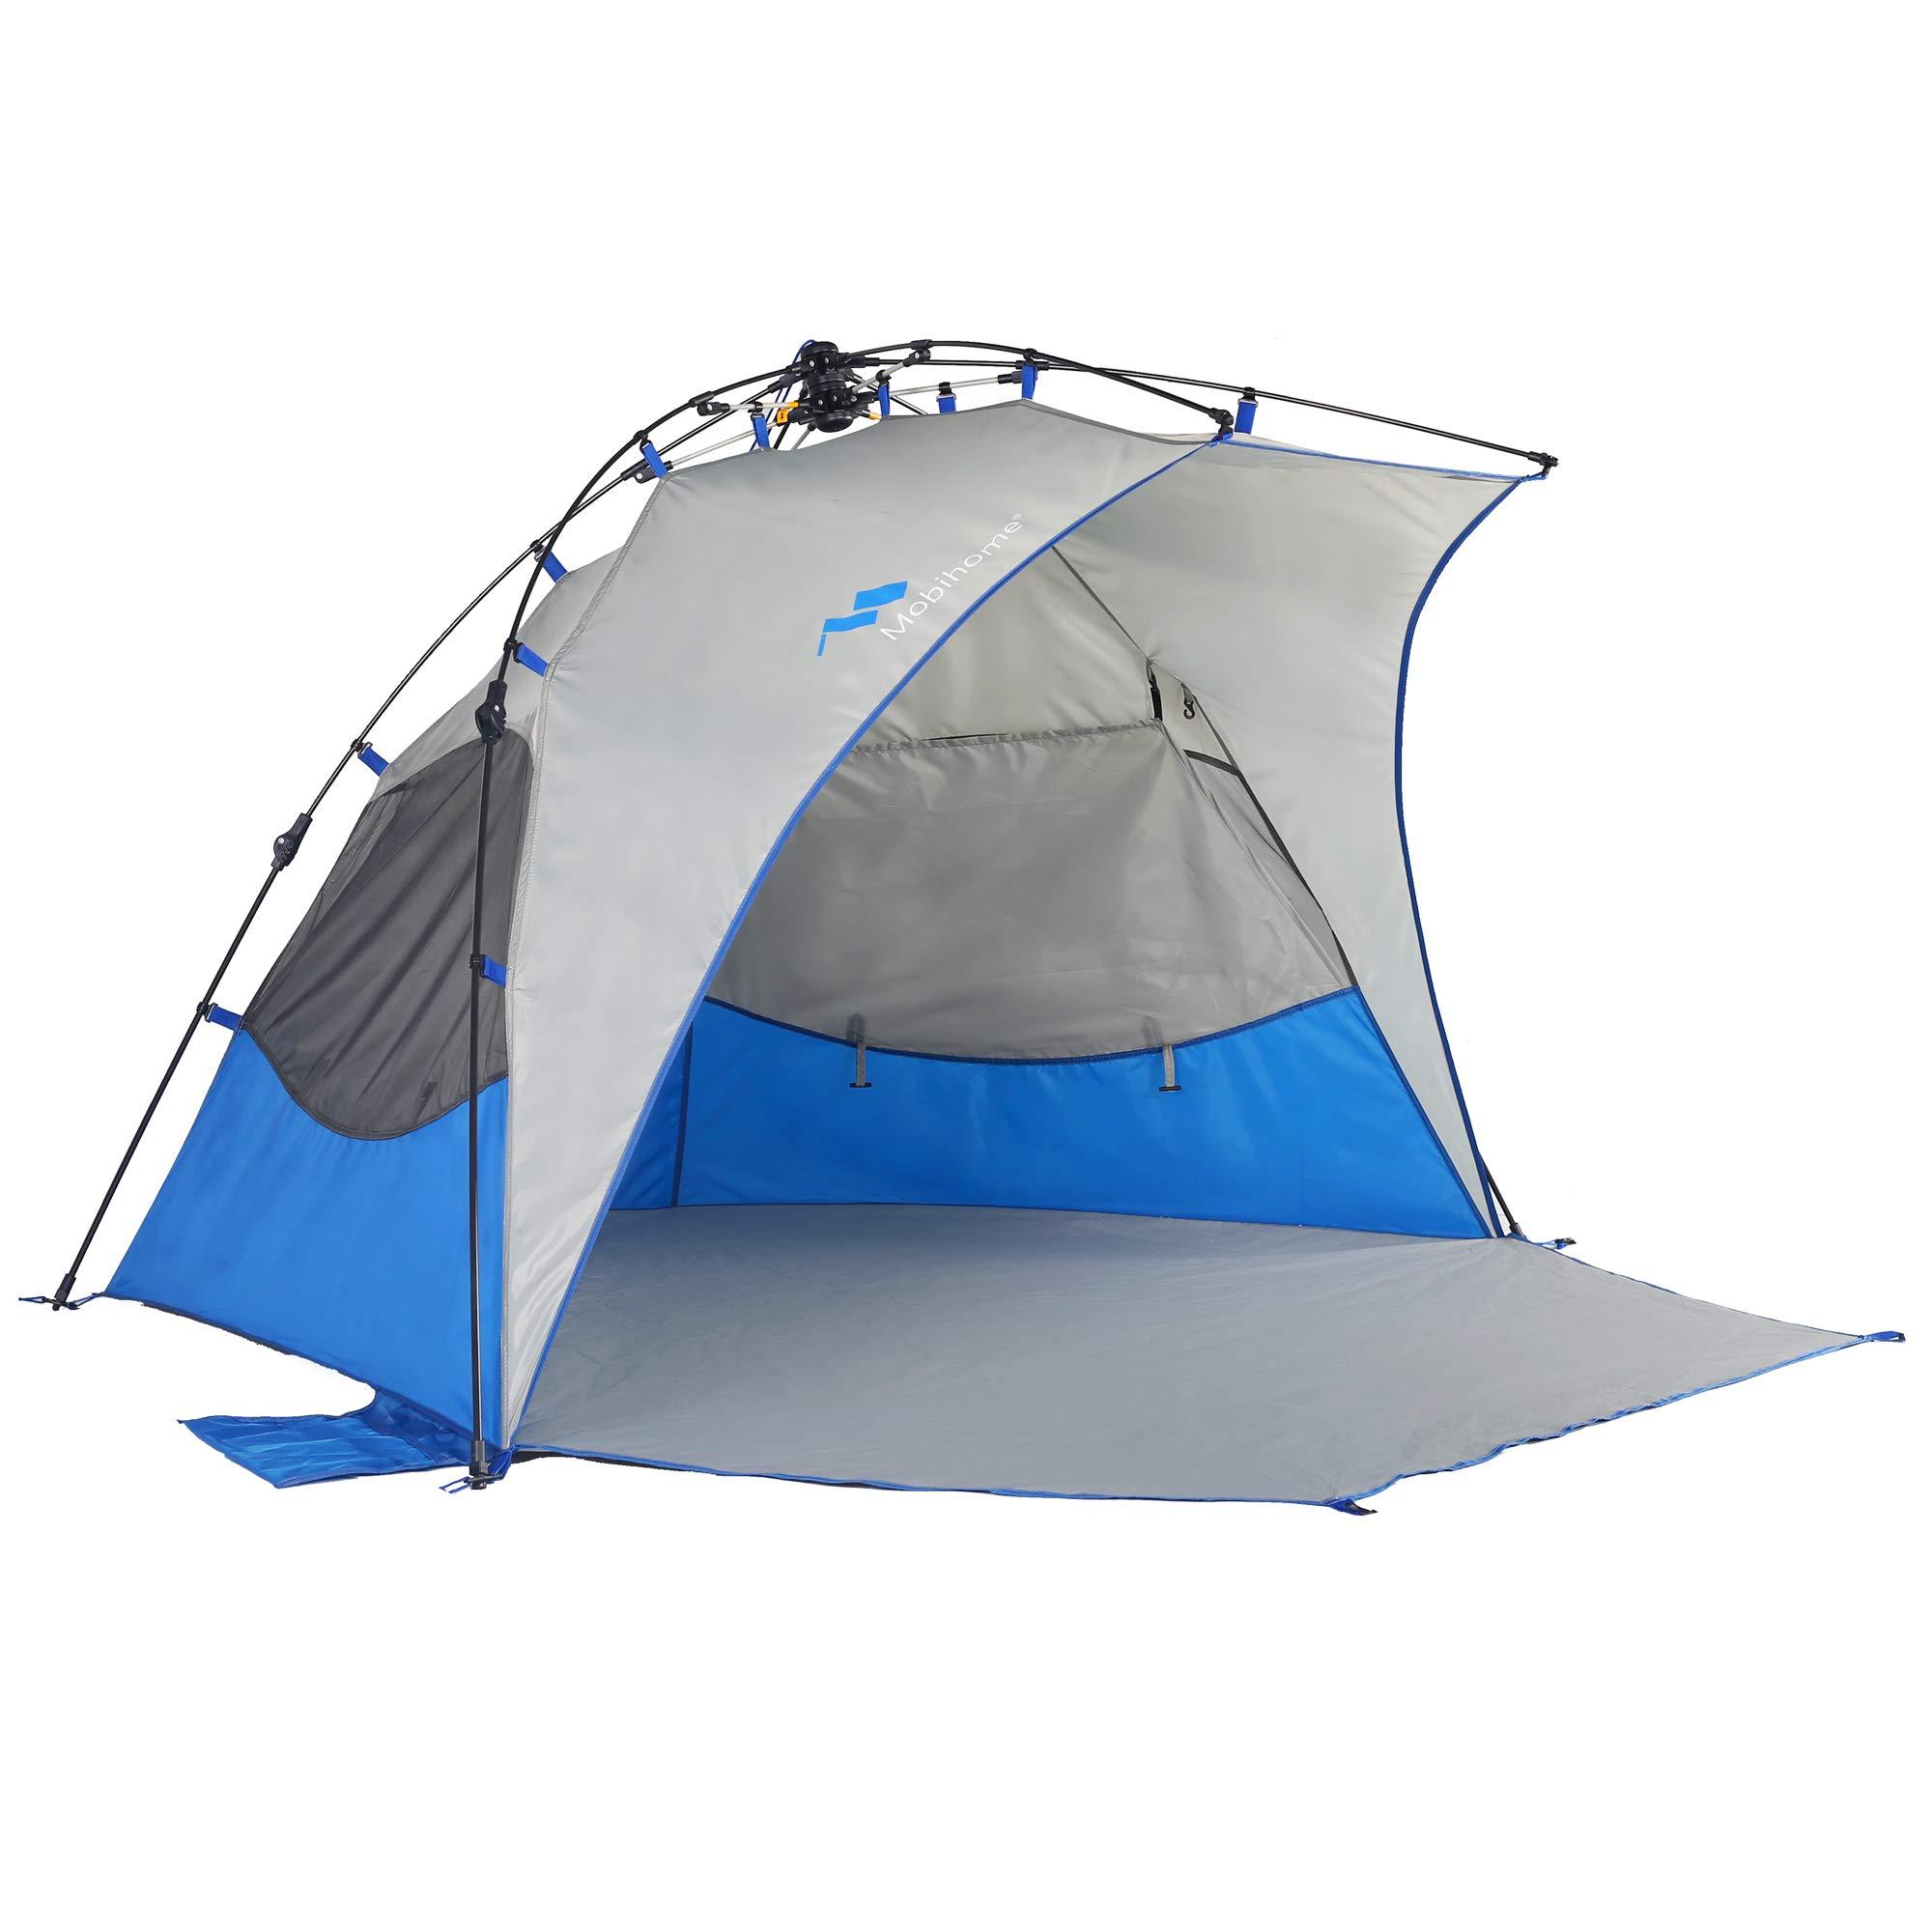 Mobihome Shelter Instant Umbrella Portable